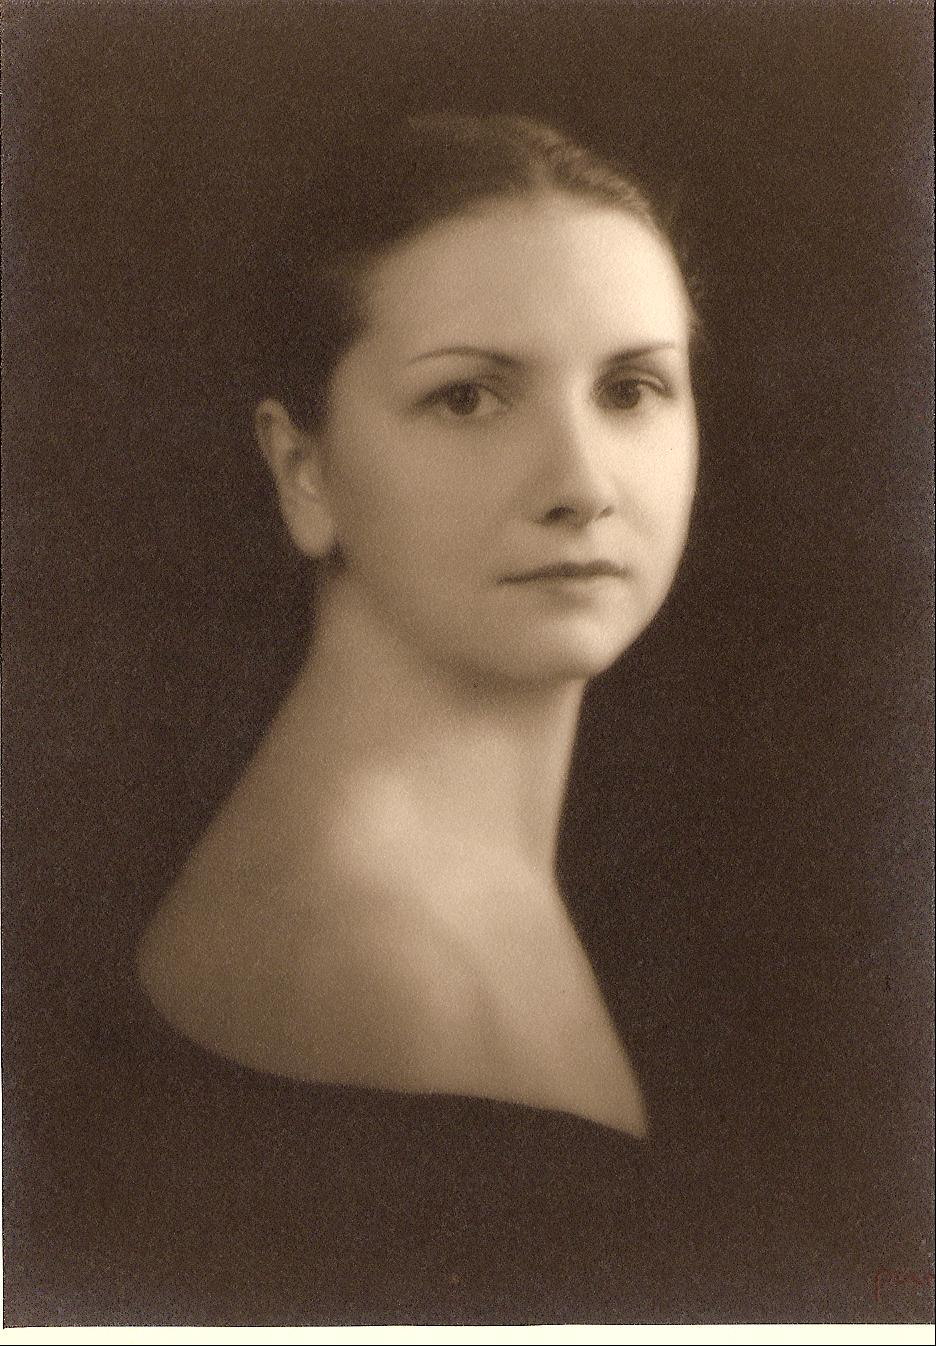 Theora Marie Stephens